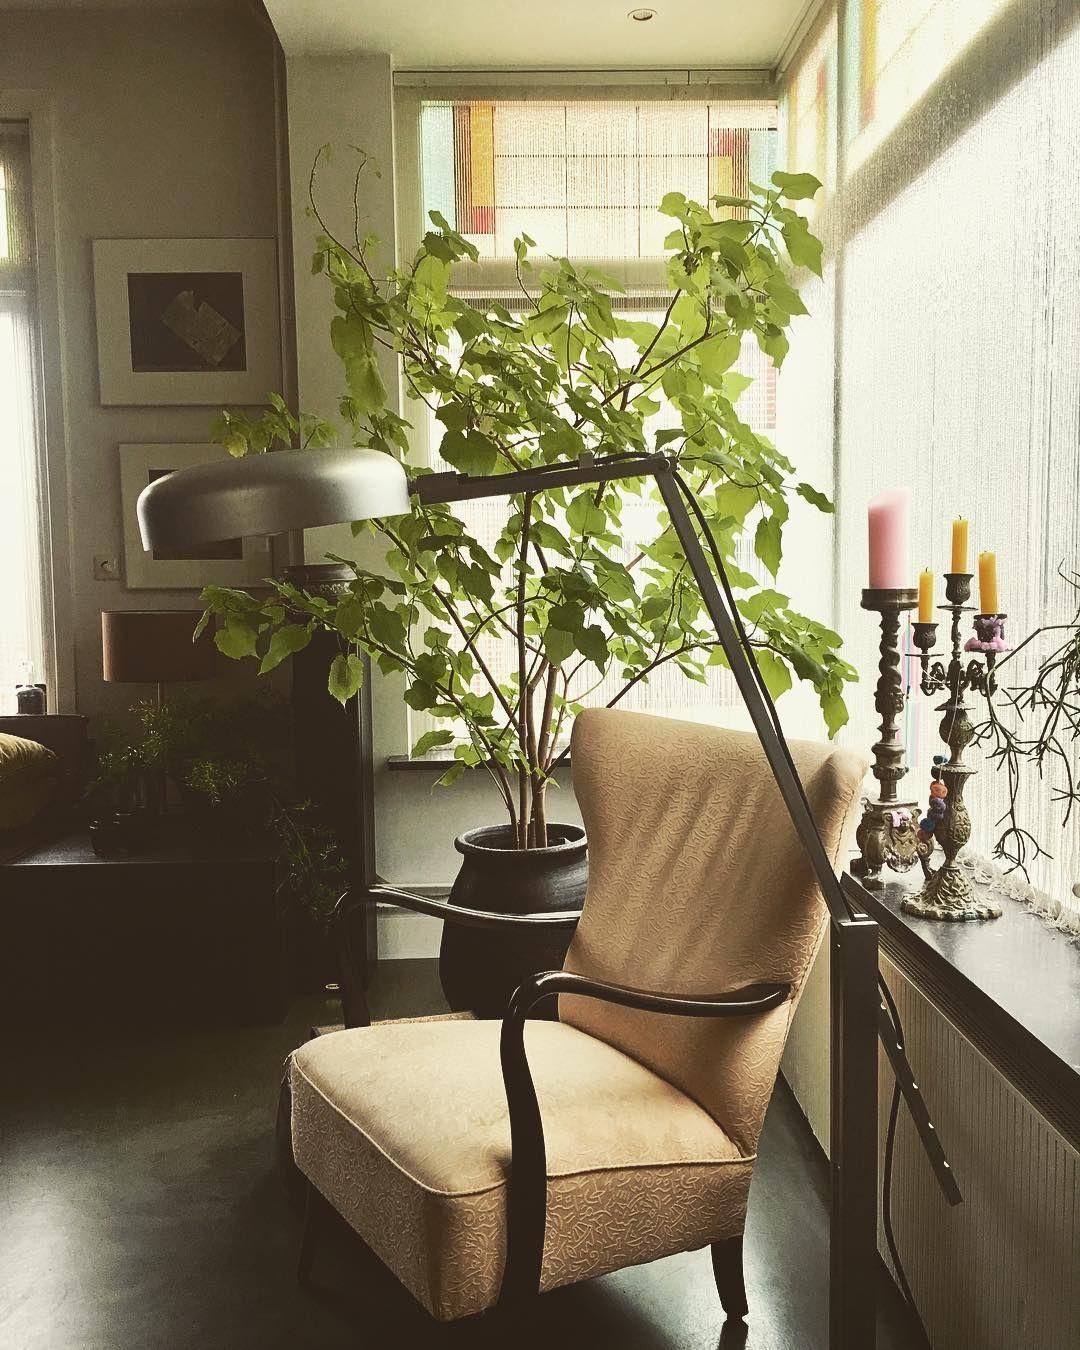 Sparmannia Africana Indoor Lime Zimmerlinde Plantas De Interior Interior Indoor Plants